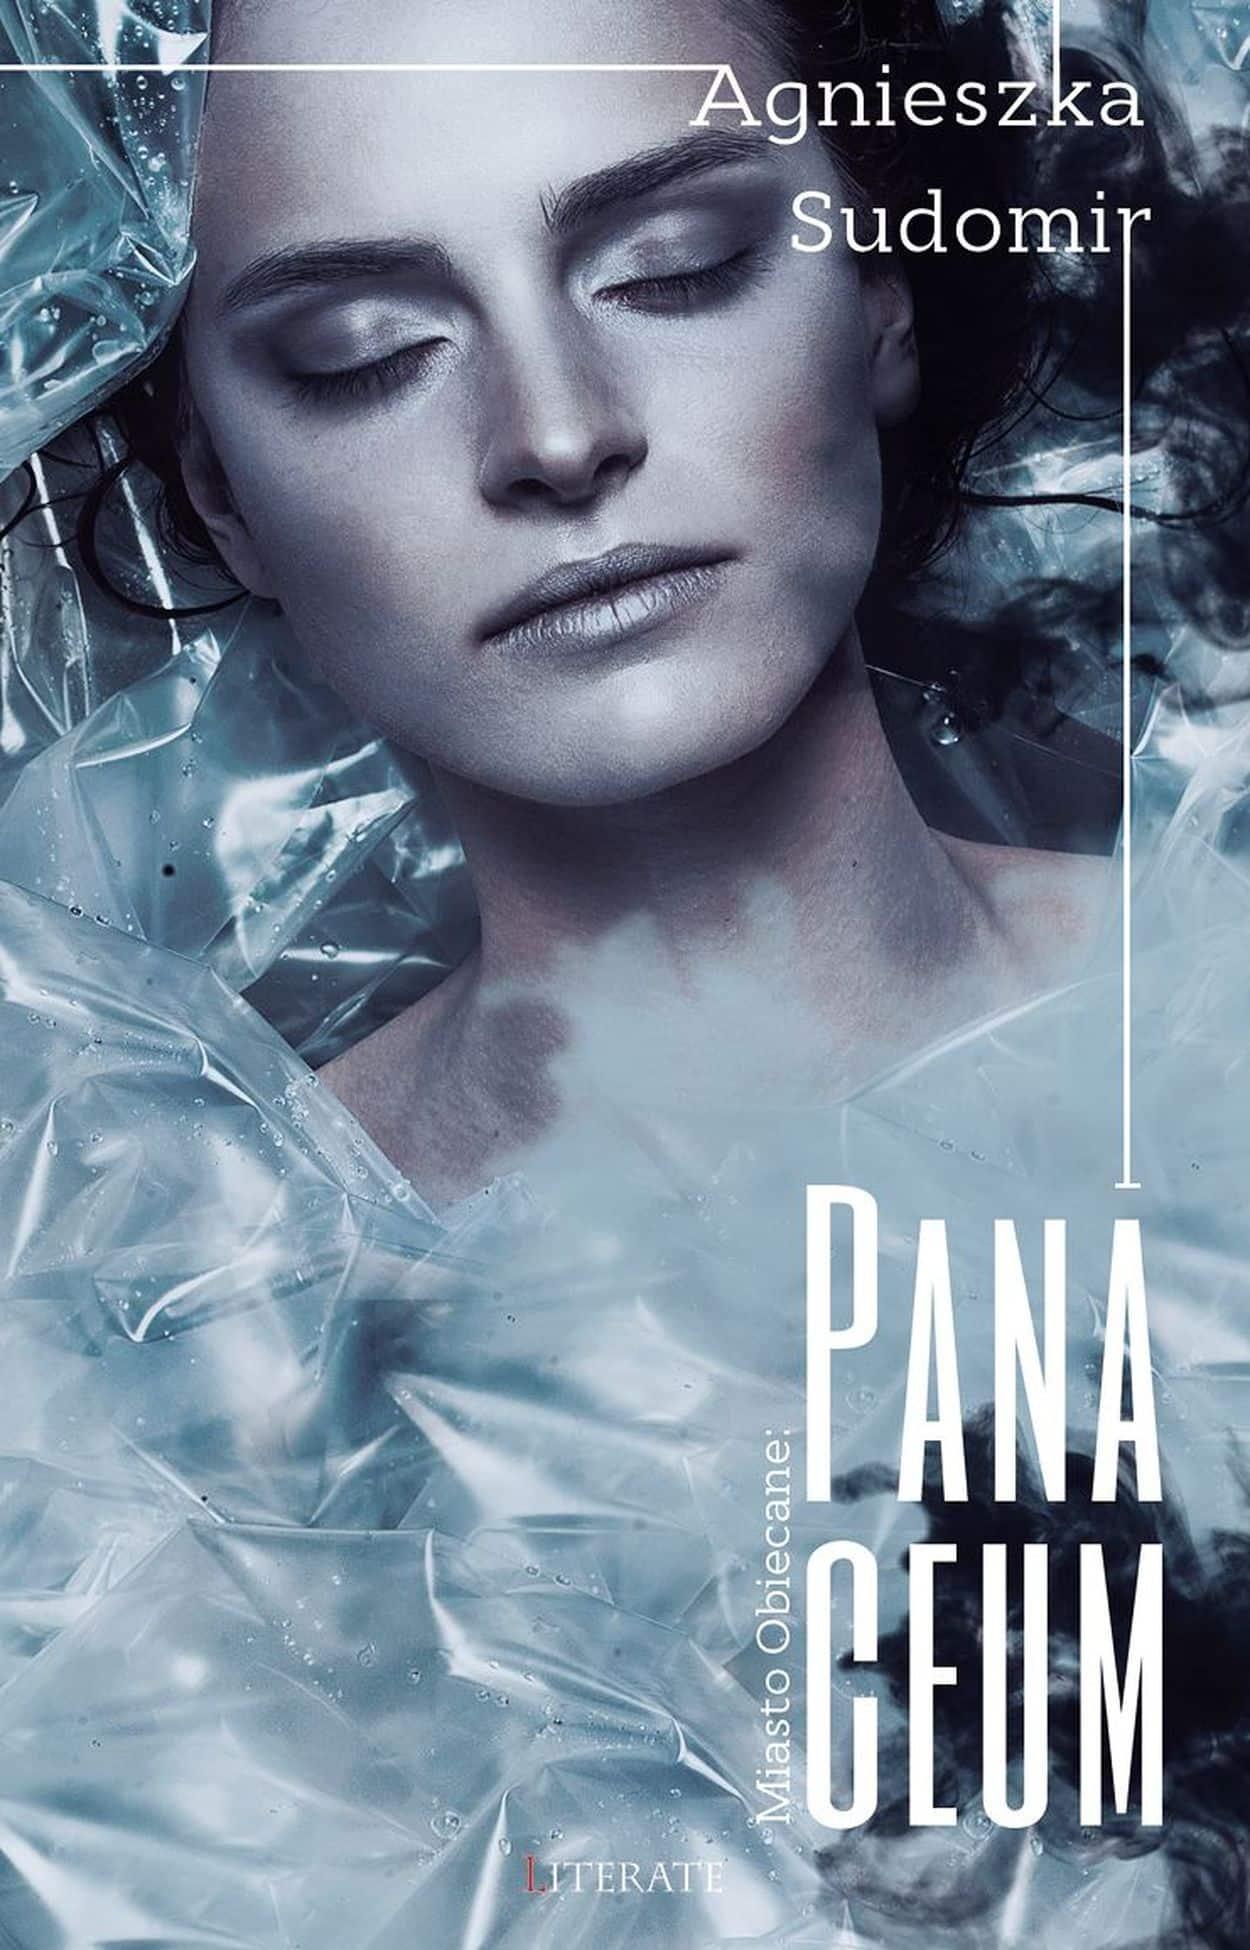 Panaceum - Agnieszka Sudomir